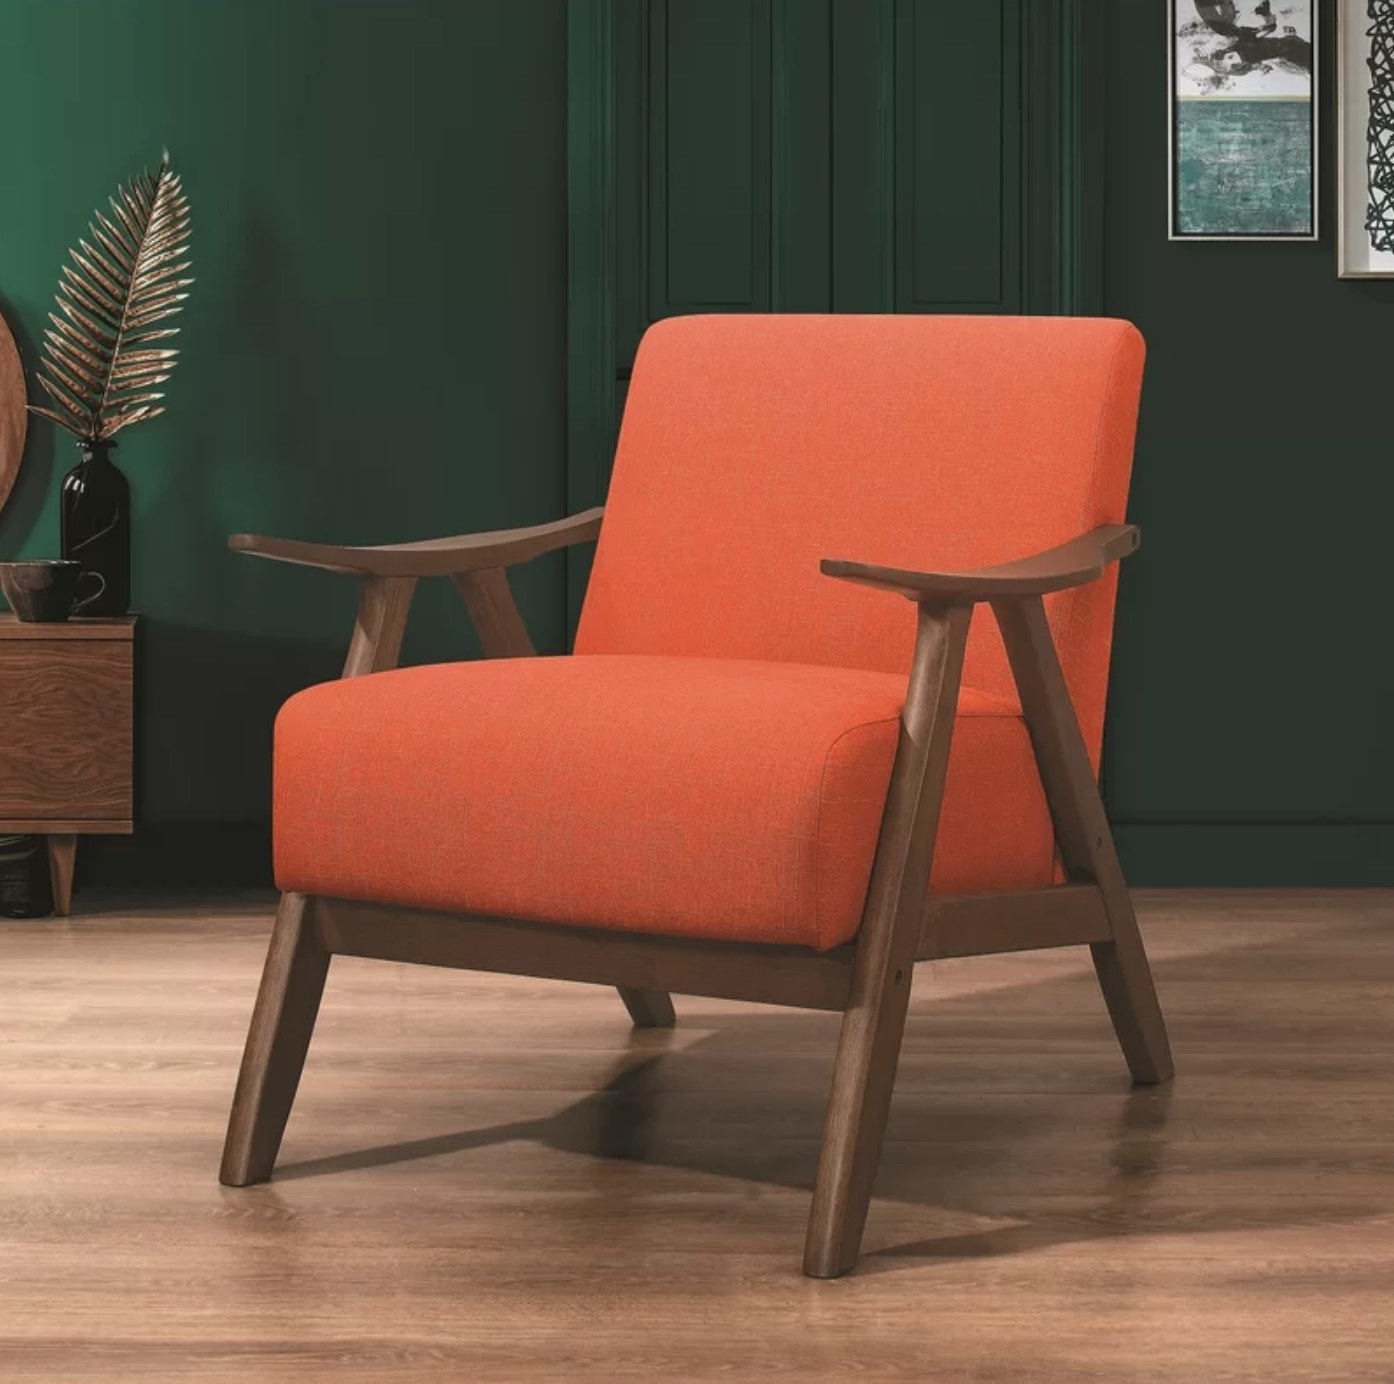 The mid-century armchair in orange polyester